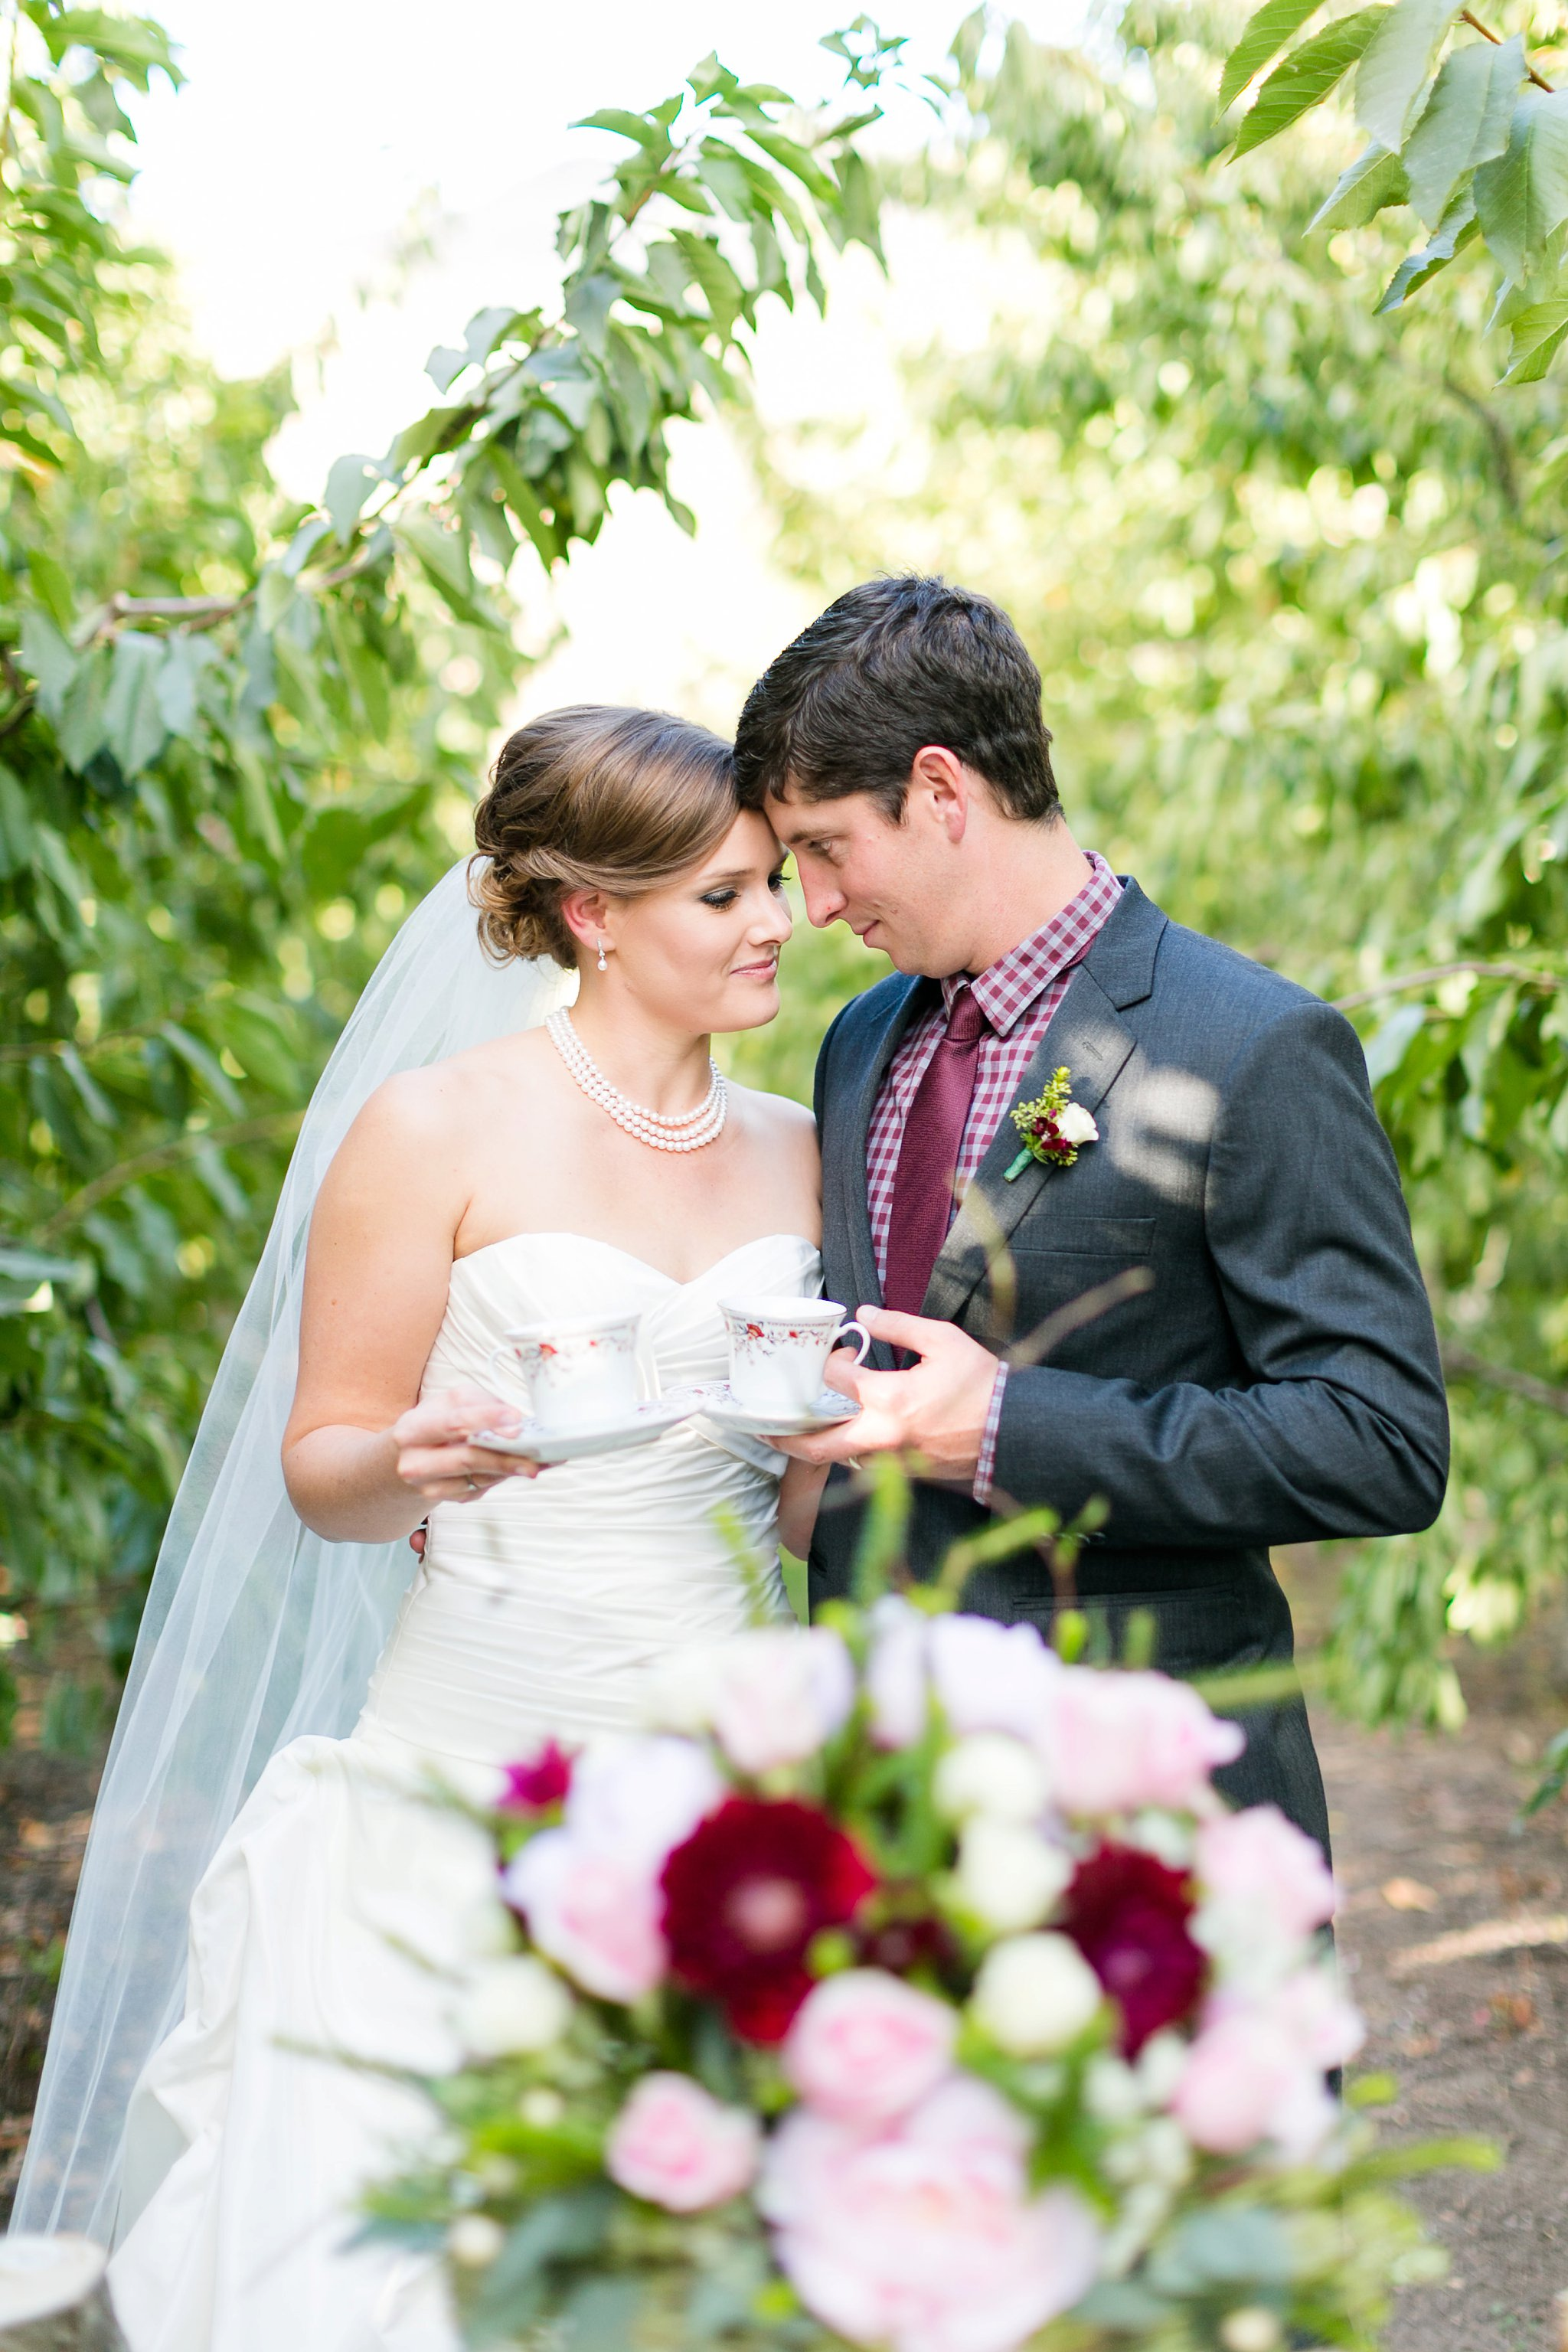 Chelan Washington Wedding Photos Megan Kelsey Photography Delight Wedding Workshop Styled Shoot Annalee & Scot-75.jpg